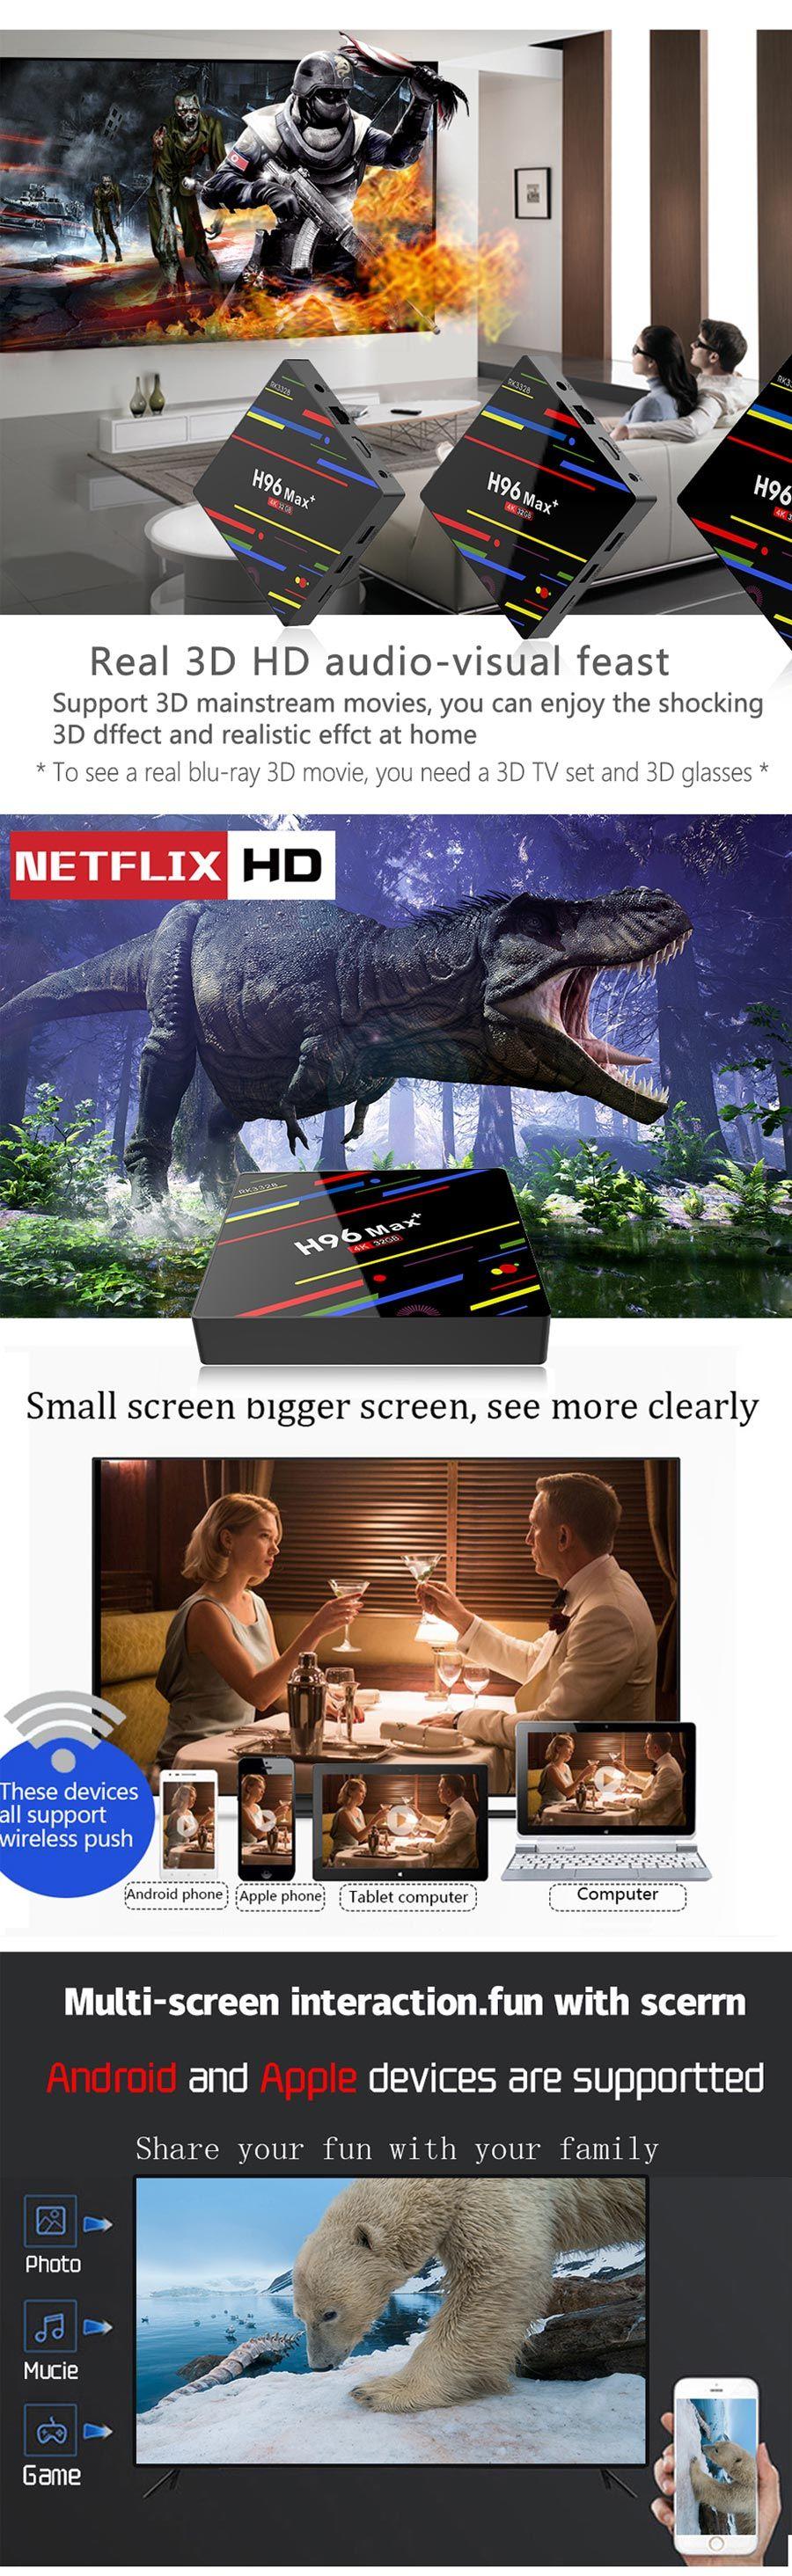 h96 max plus android 8.1 smart tv box 4gb 32/64gb 4k wifi voice